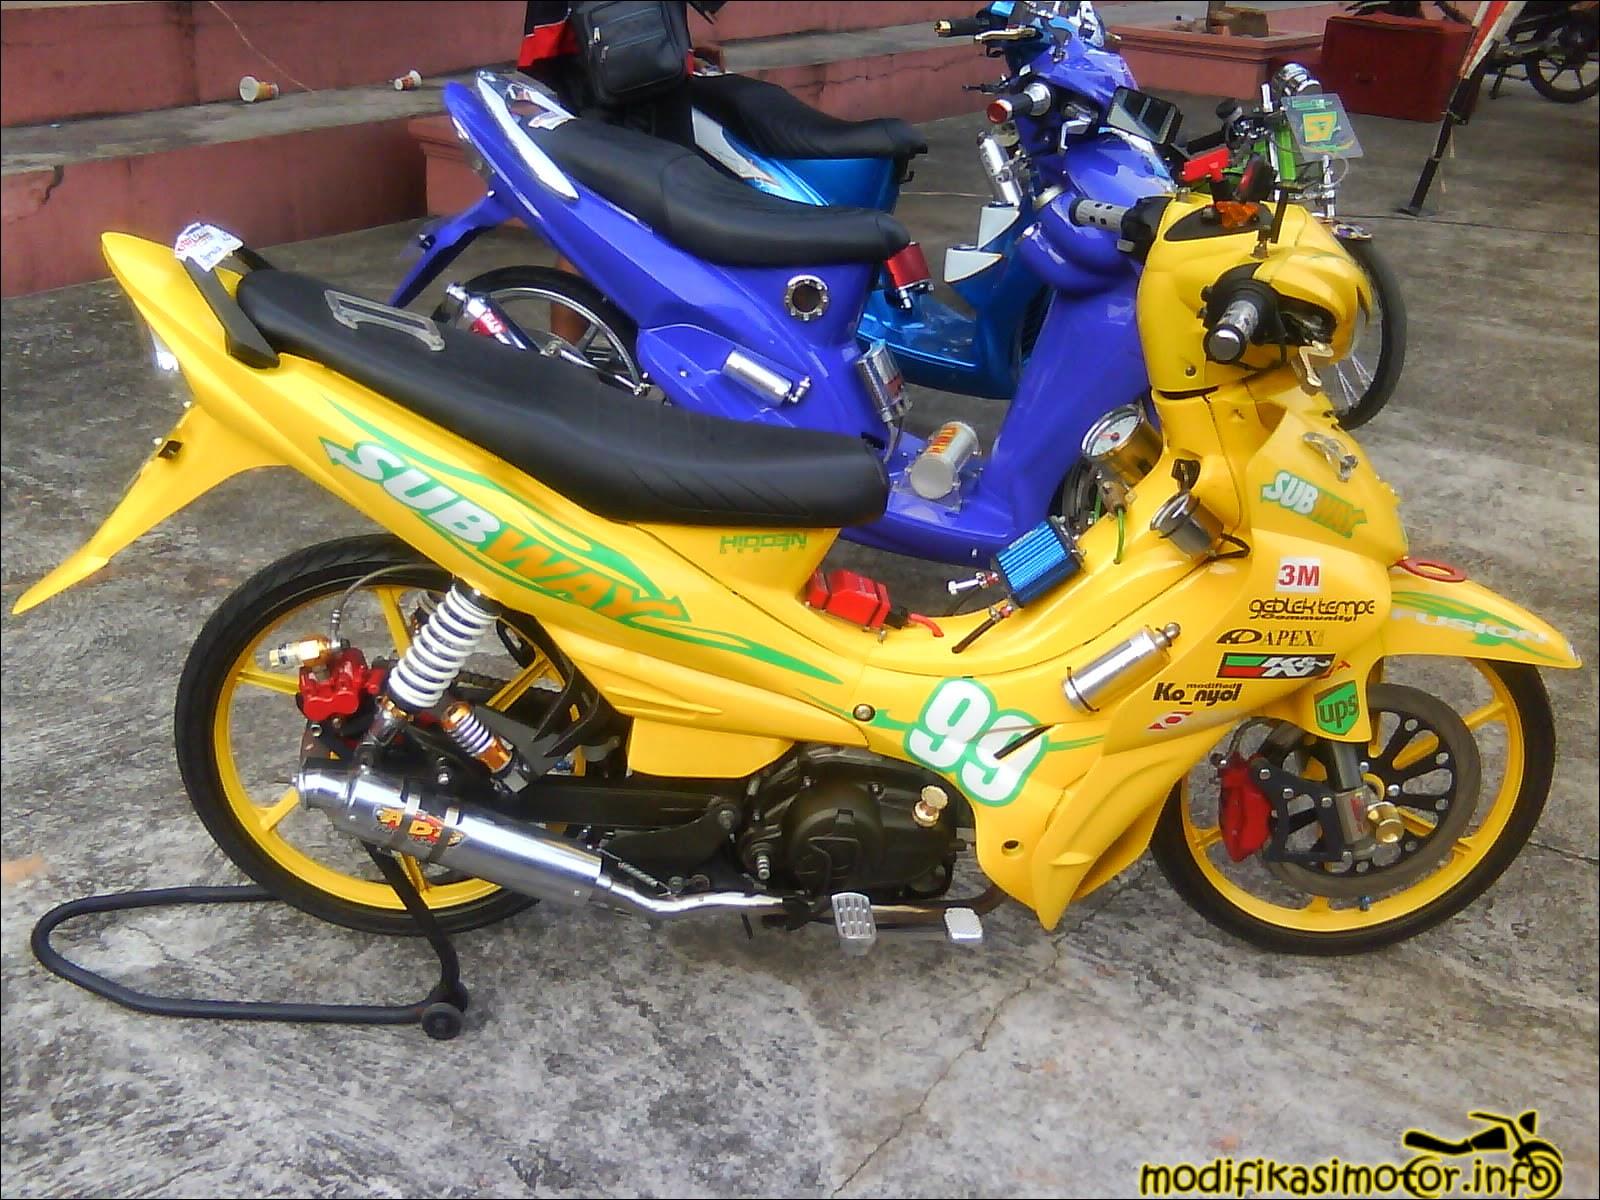 Modifikasi Motor Yamaha Jupiter Z Terbaru Kumpulan Modifikasi Motor